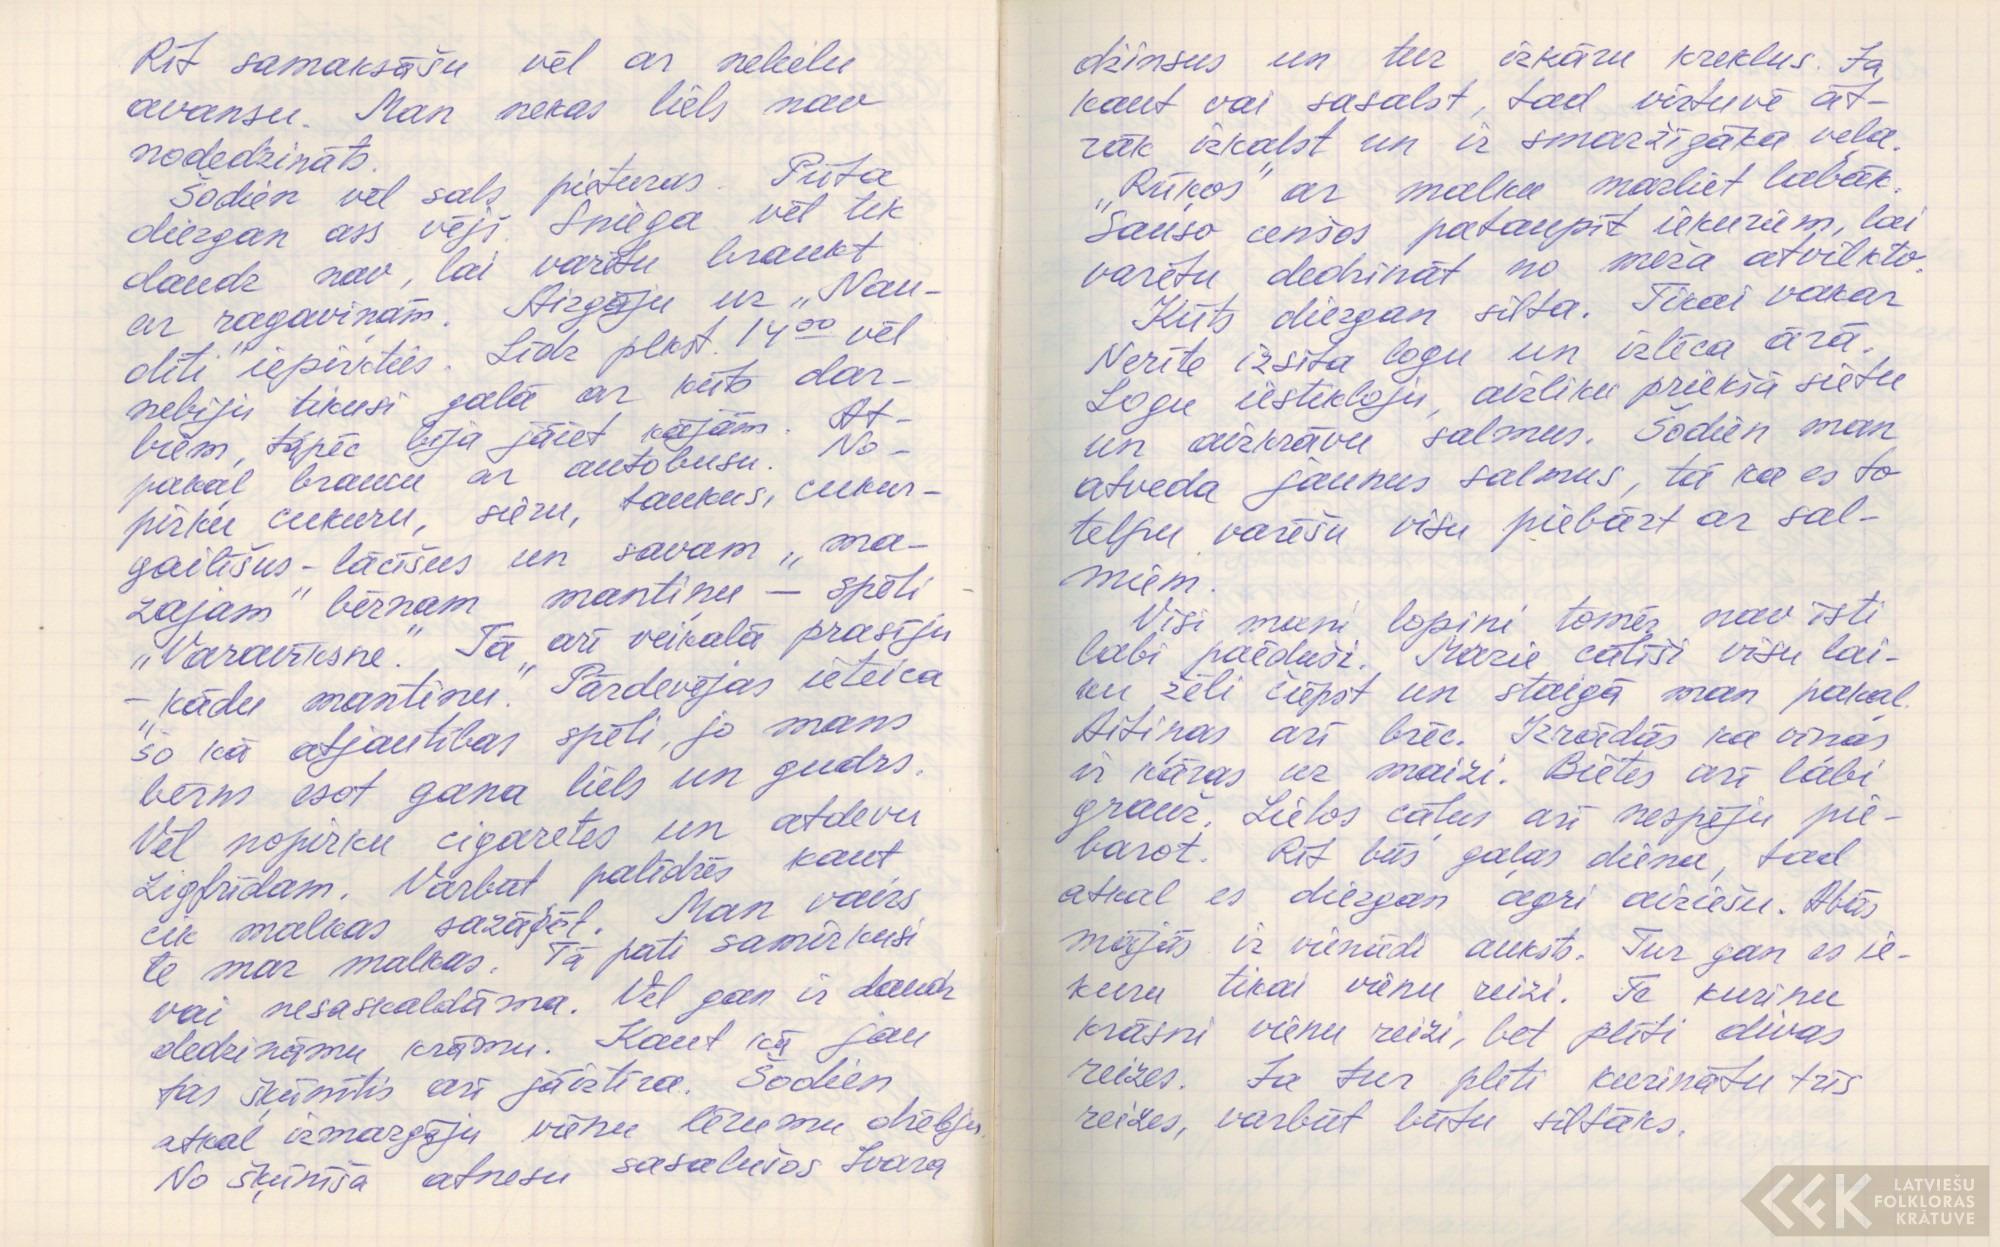 Ak161-Ligitas-Vucenas-dienasgramatas-28-0031